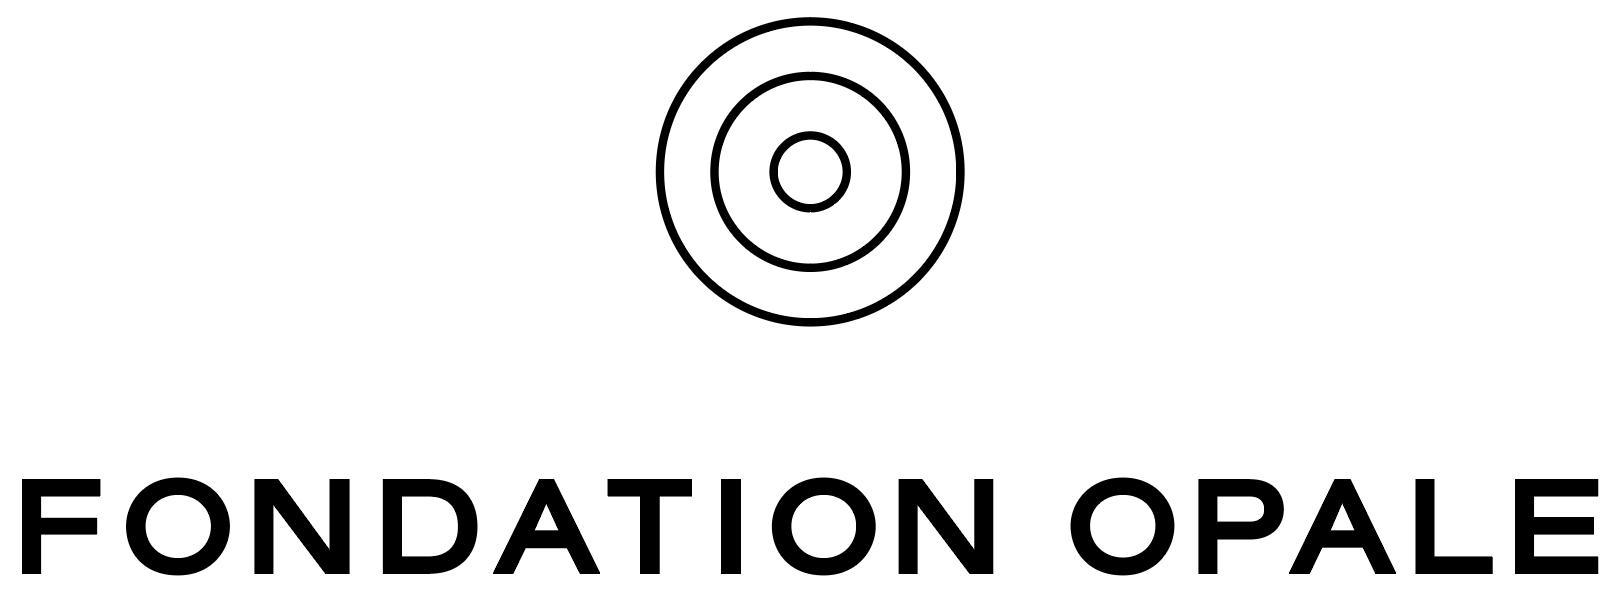 Fondation Opale